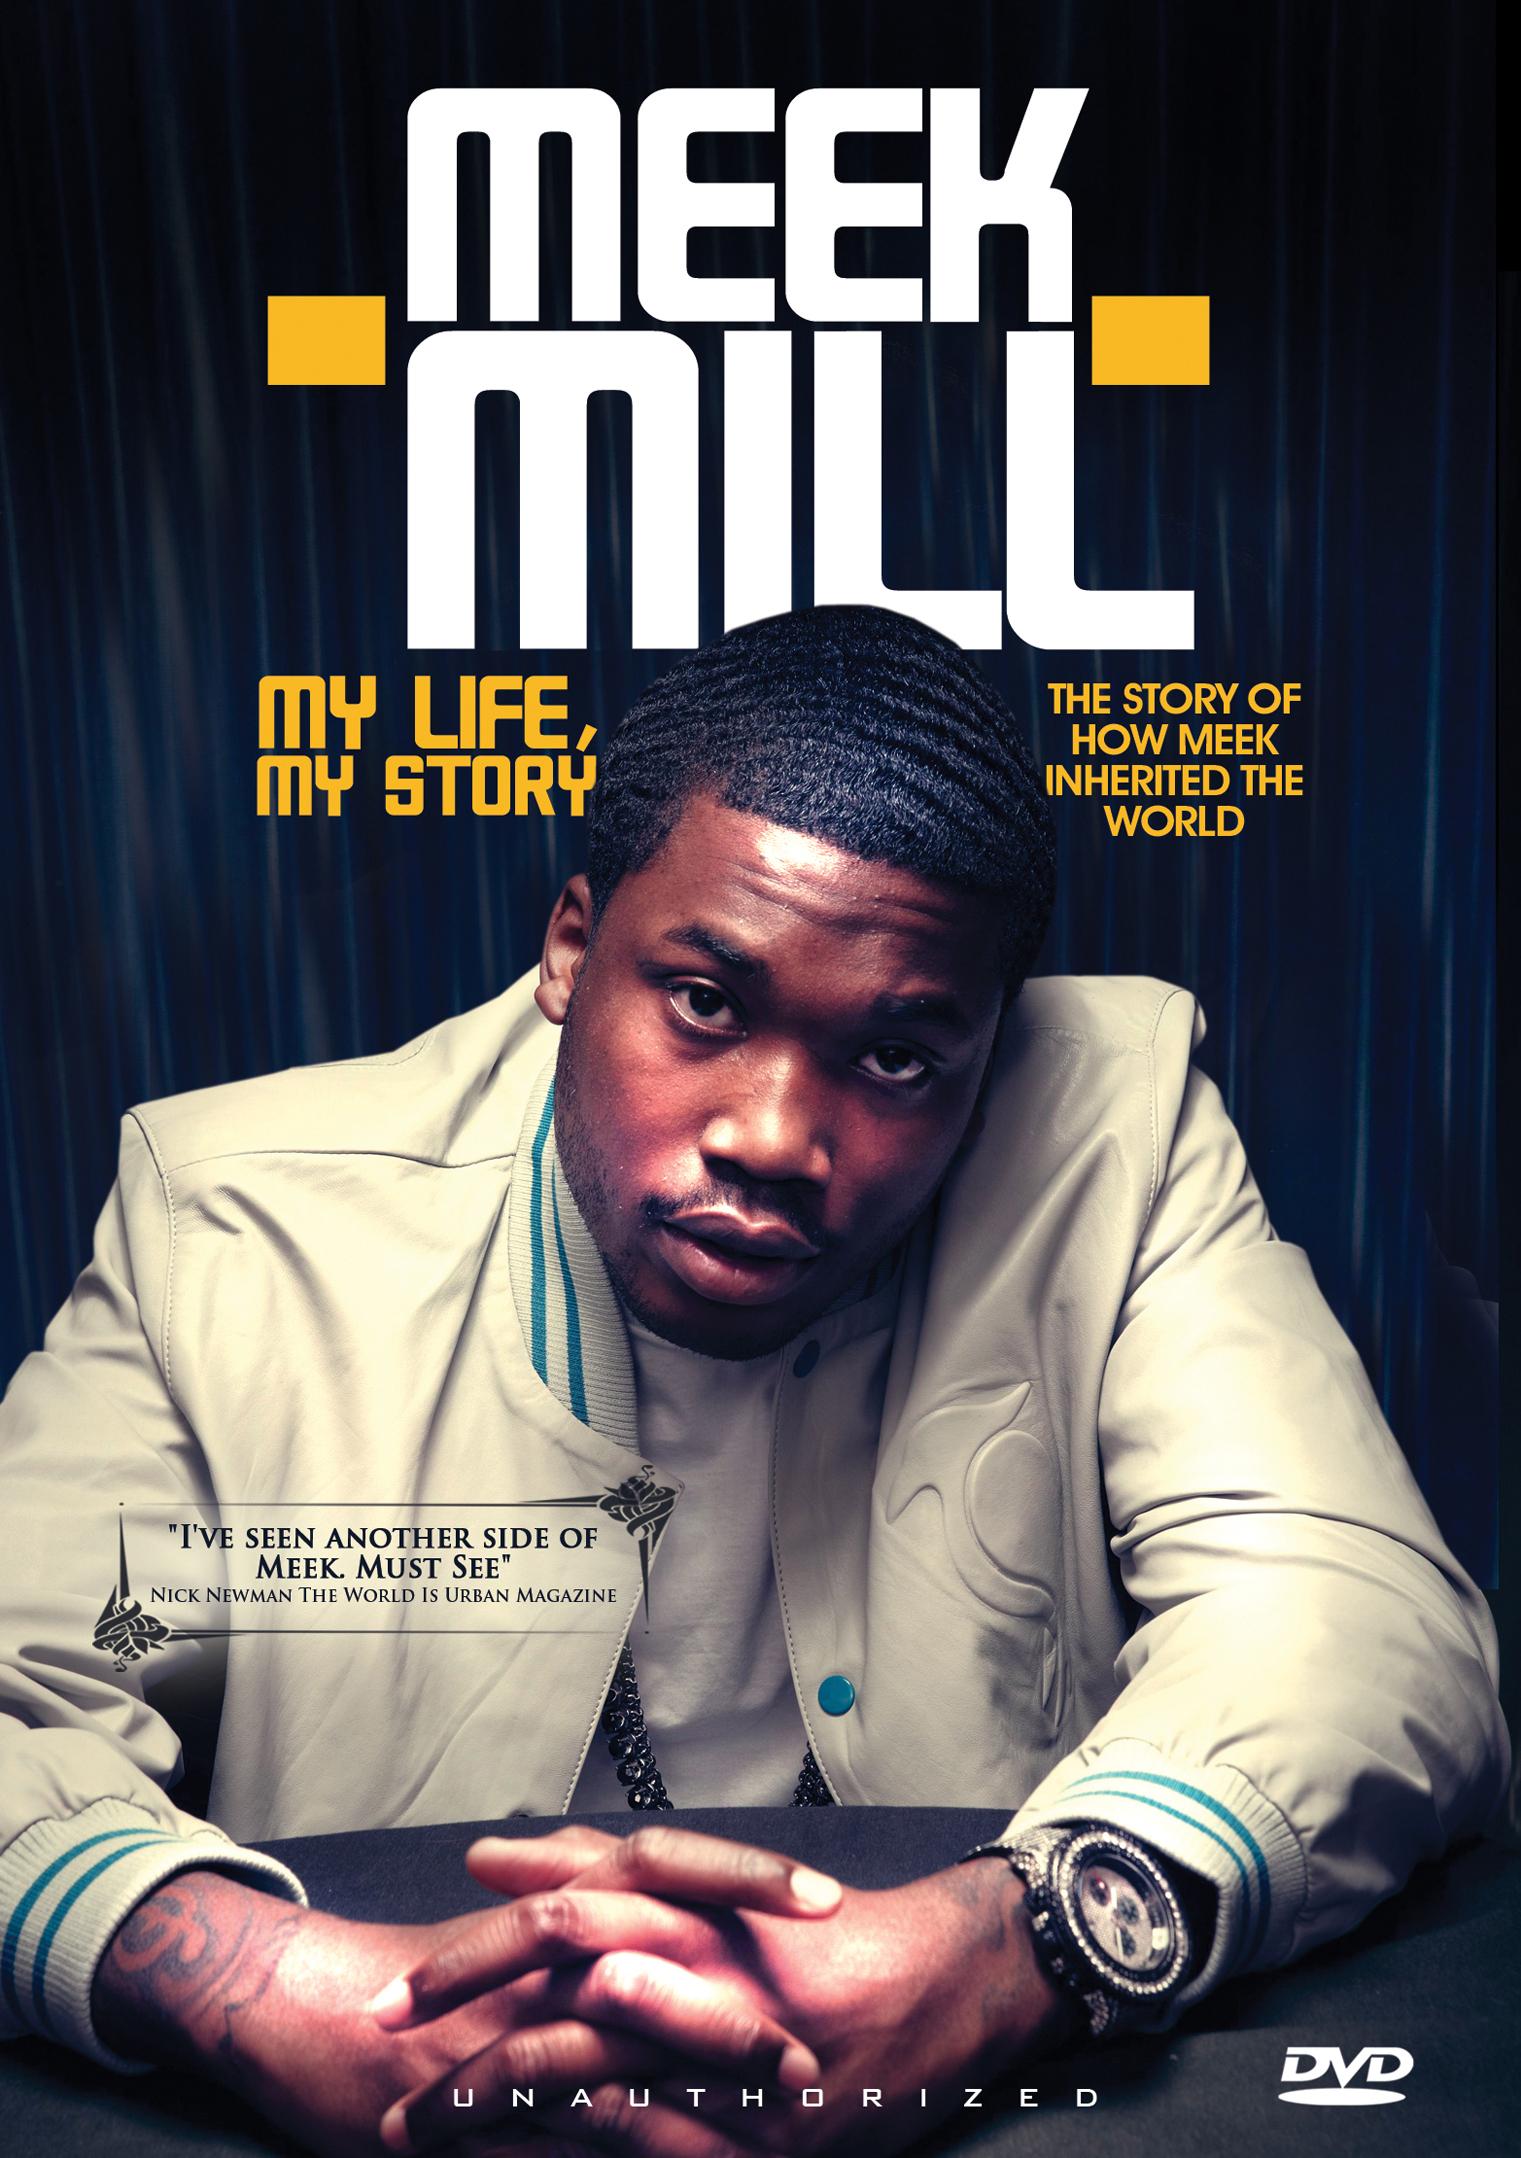 Meek Mill: My Life, My Story - Unauthorized